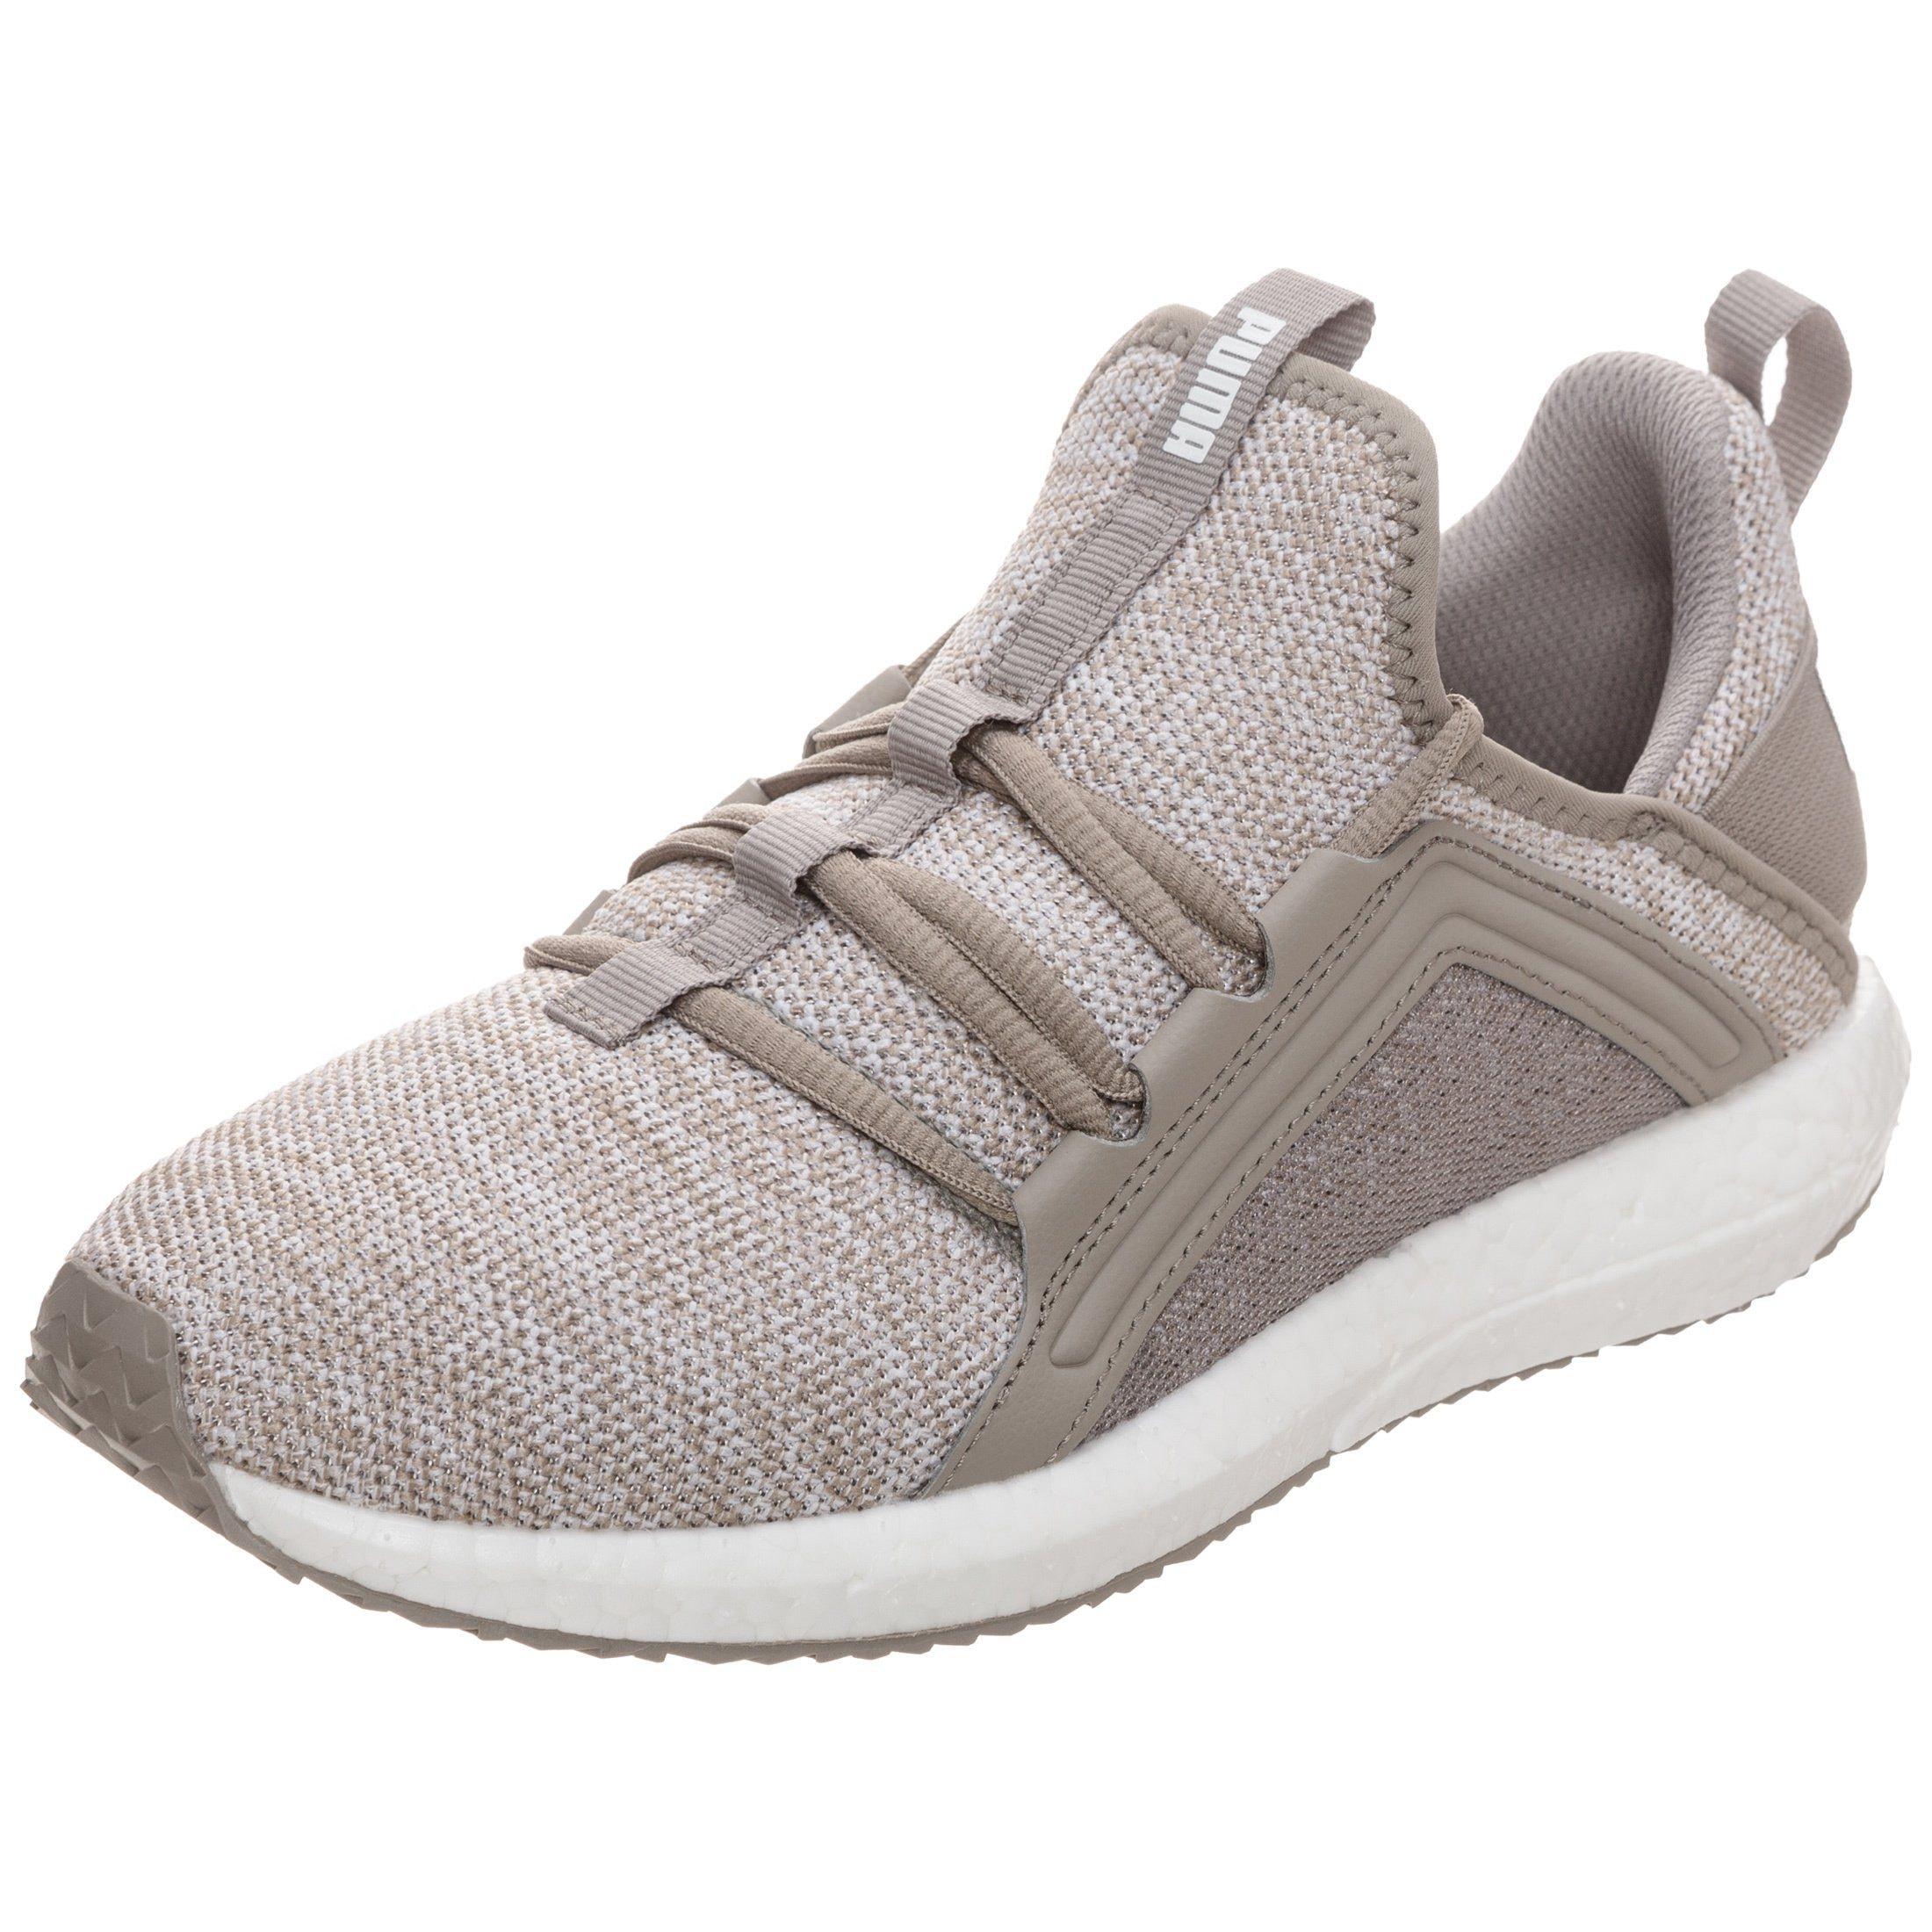 PUMA Sneaker Mega Rechnung Nrgy Knit per Rechnung Mega | Gutes Preis-Leistungs-Verhältnis, es lohnt sich faf248